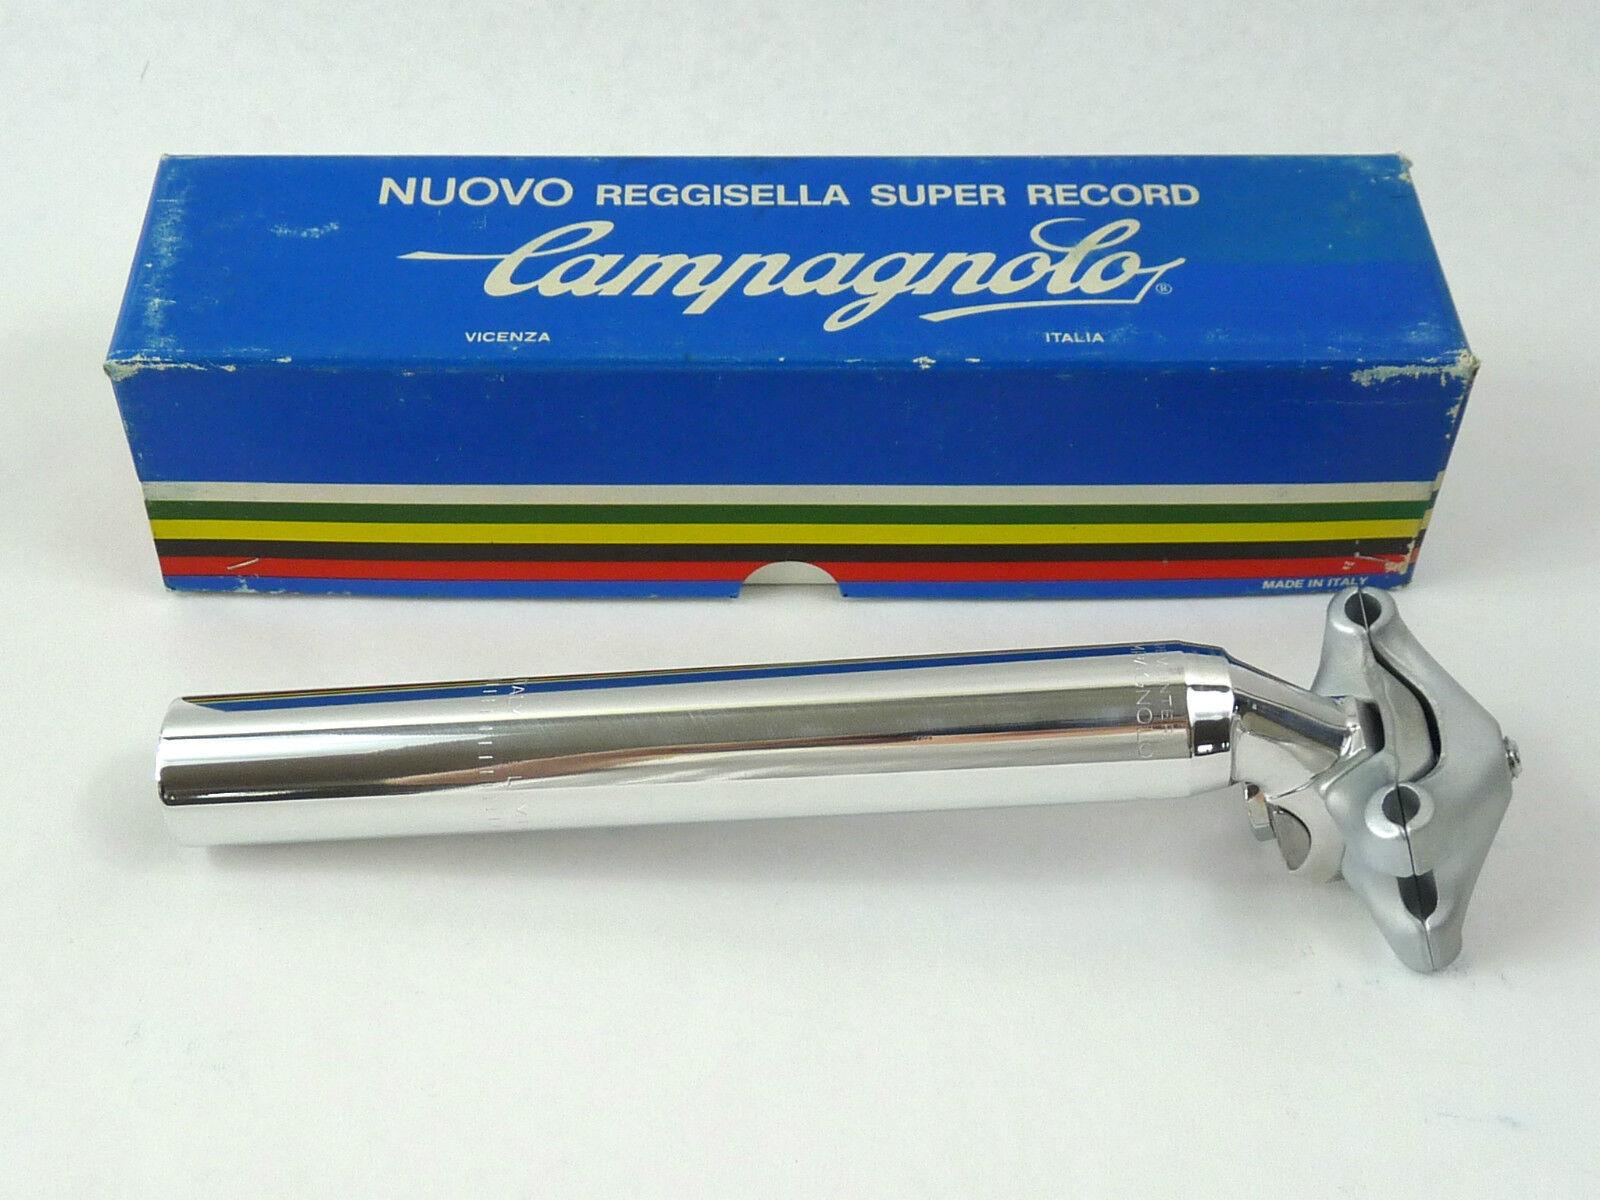 Campagnolo Super Record seatpost 26.6 Vintage Road Racing Bicycle 26.6 New NOS